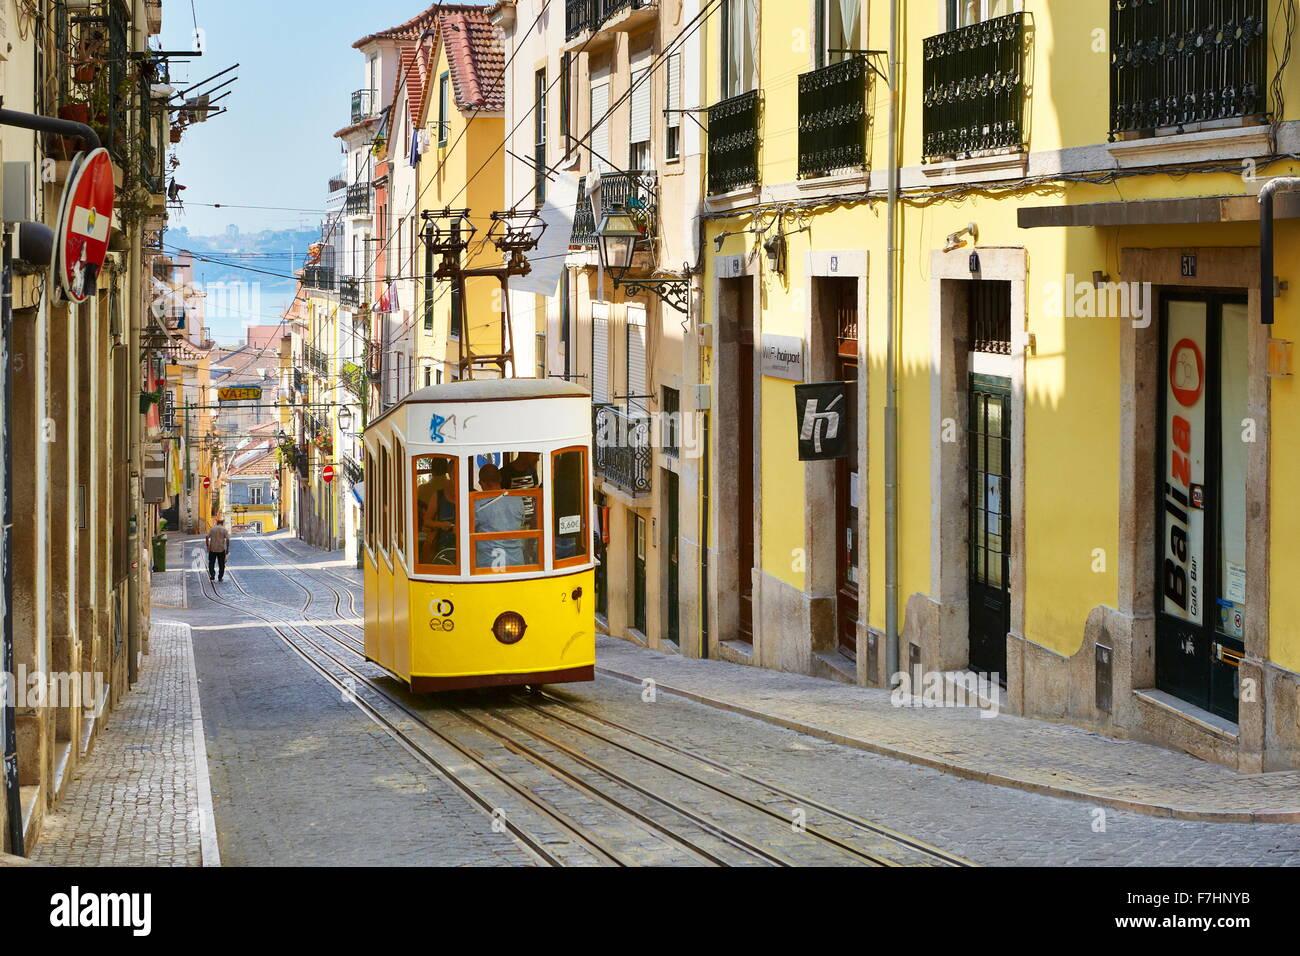 Tramway de Lisbonne, 'Elevador da Bica' Portugal Photo Stock